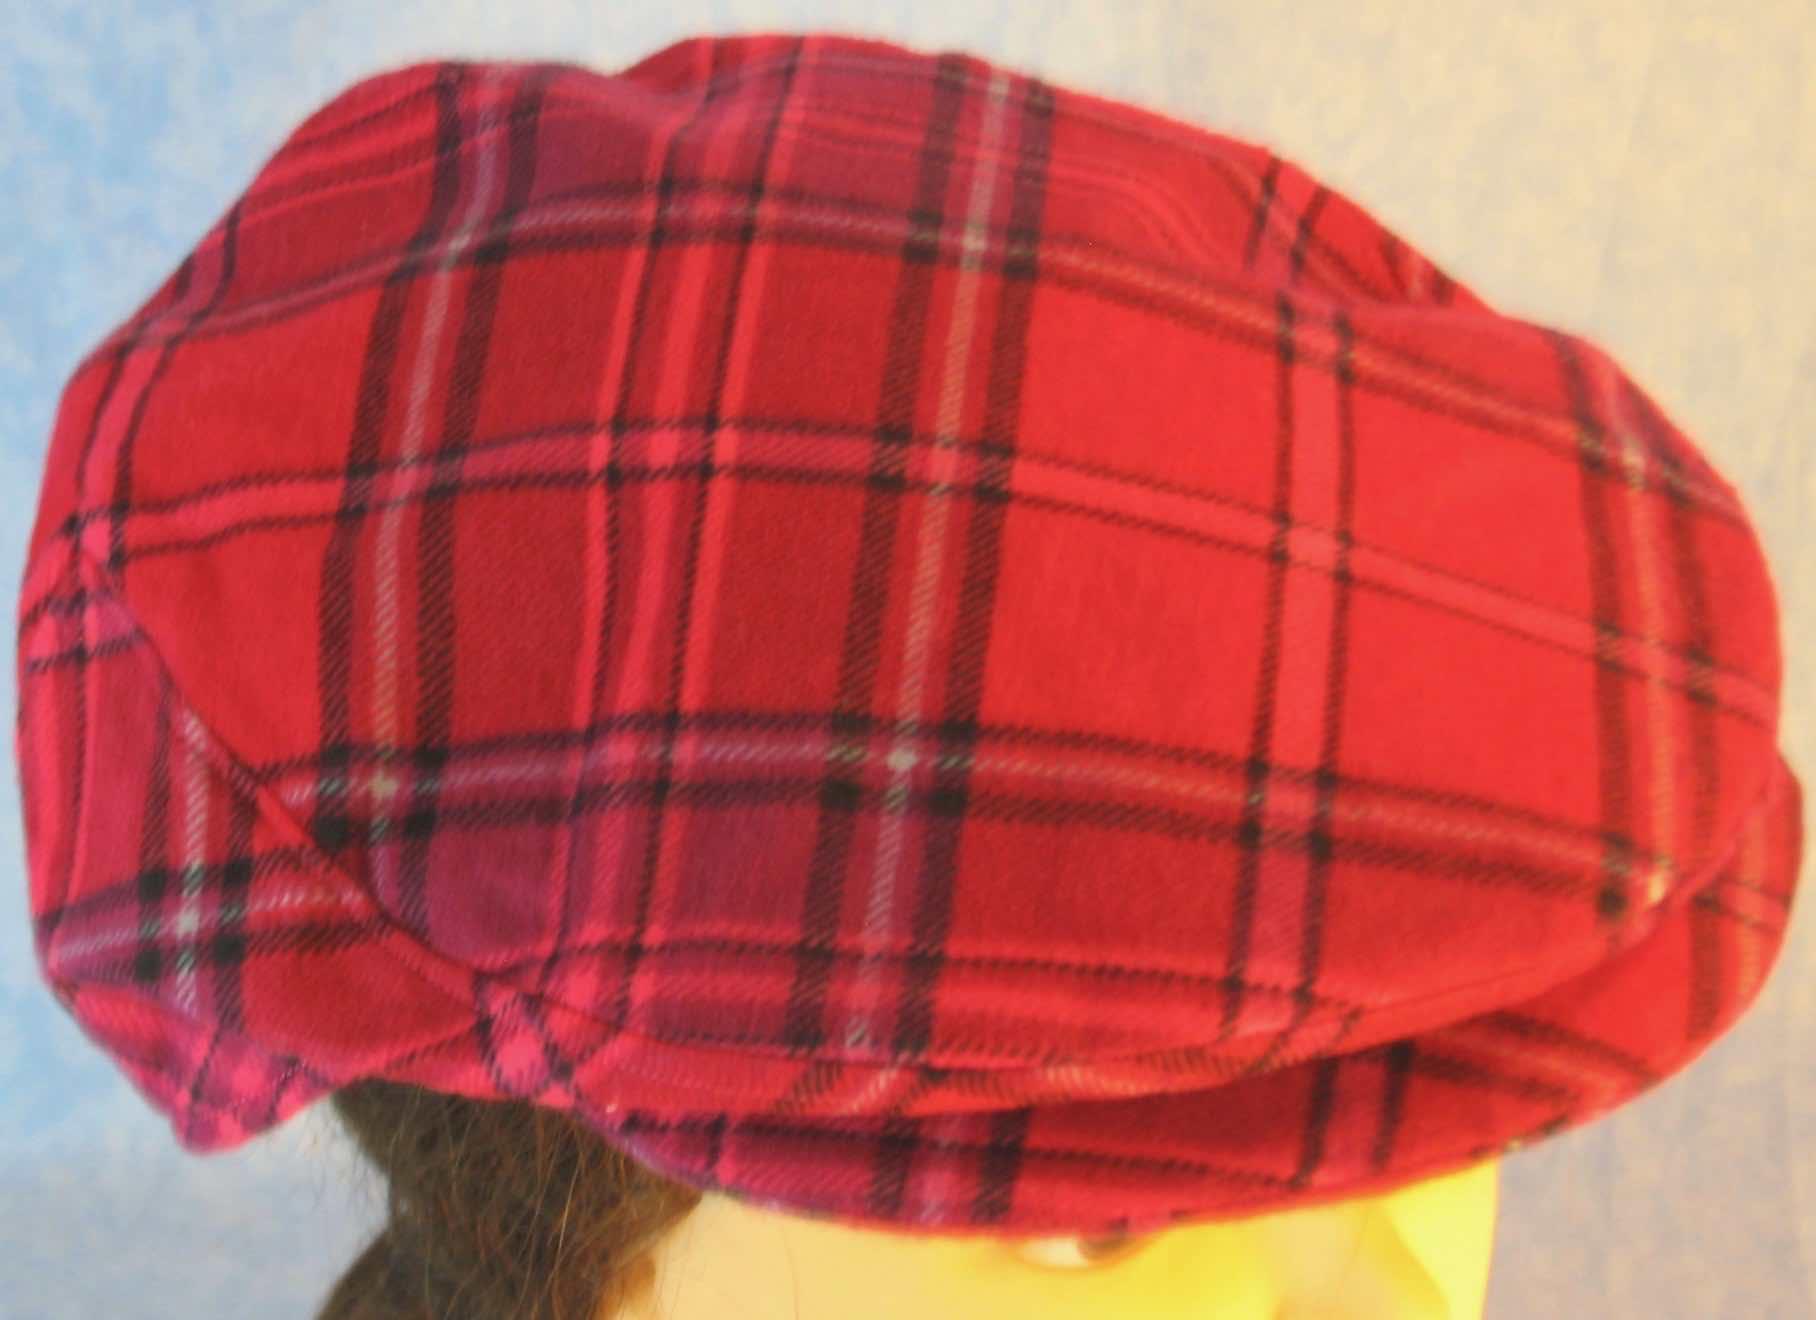 Flat Cap in Pink Lavender Plaid Flannel - Adult M-XL